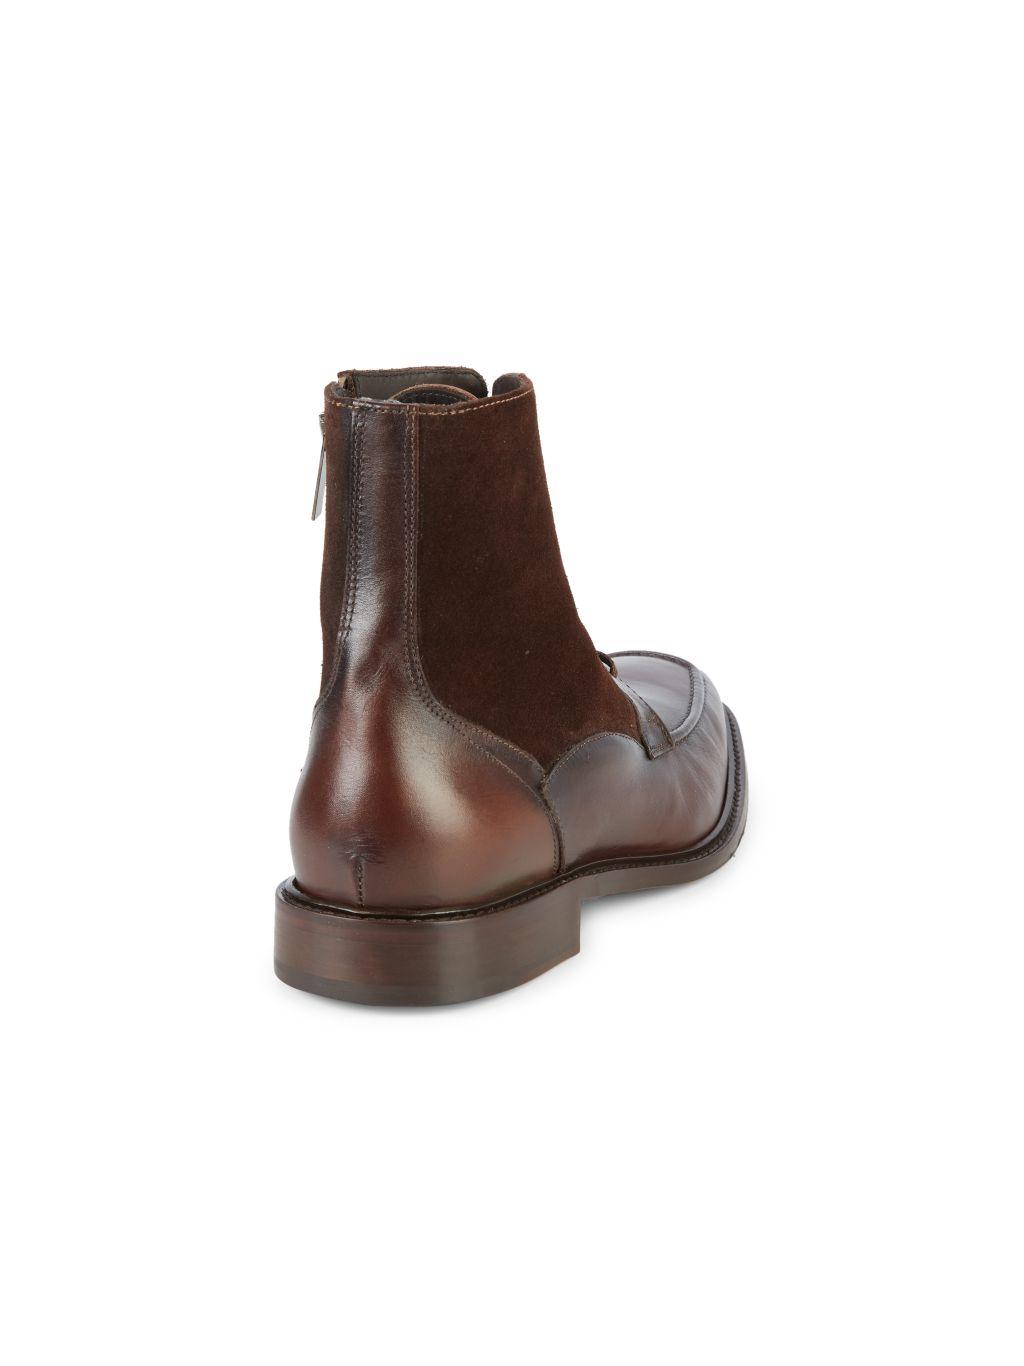 Bruno Magli Cardone Leather & Suede Boots